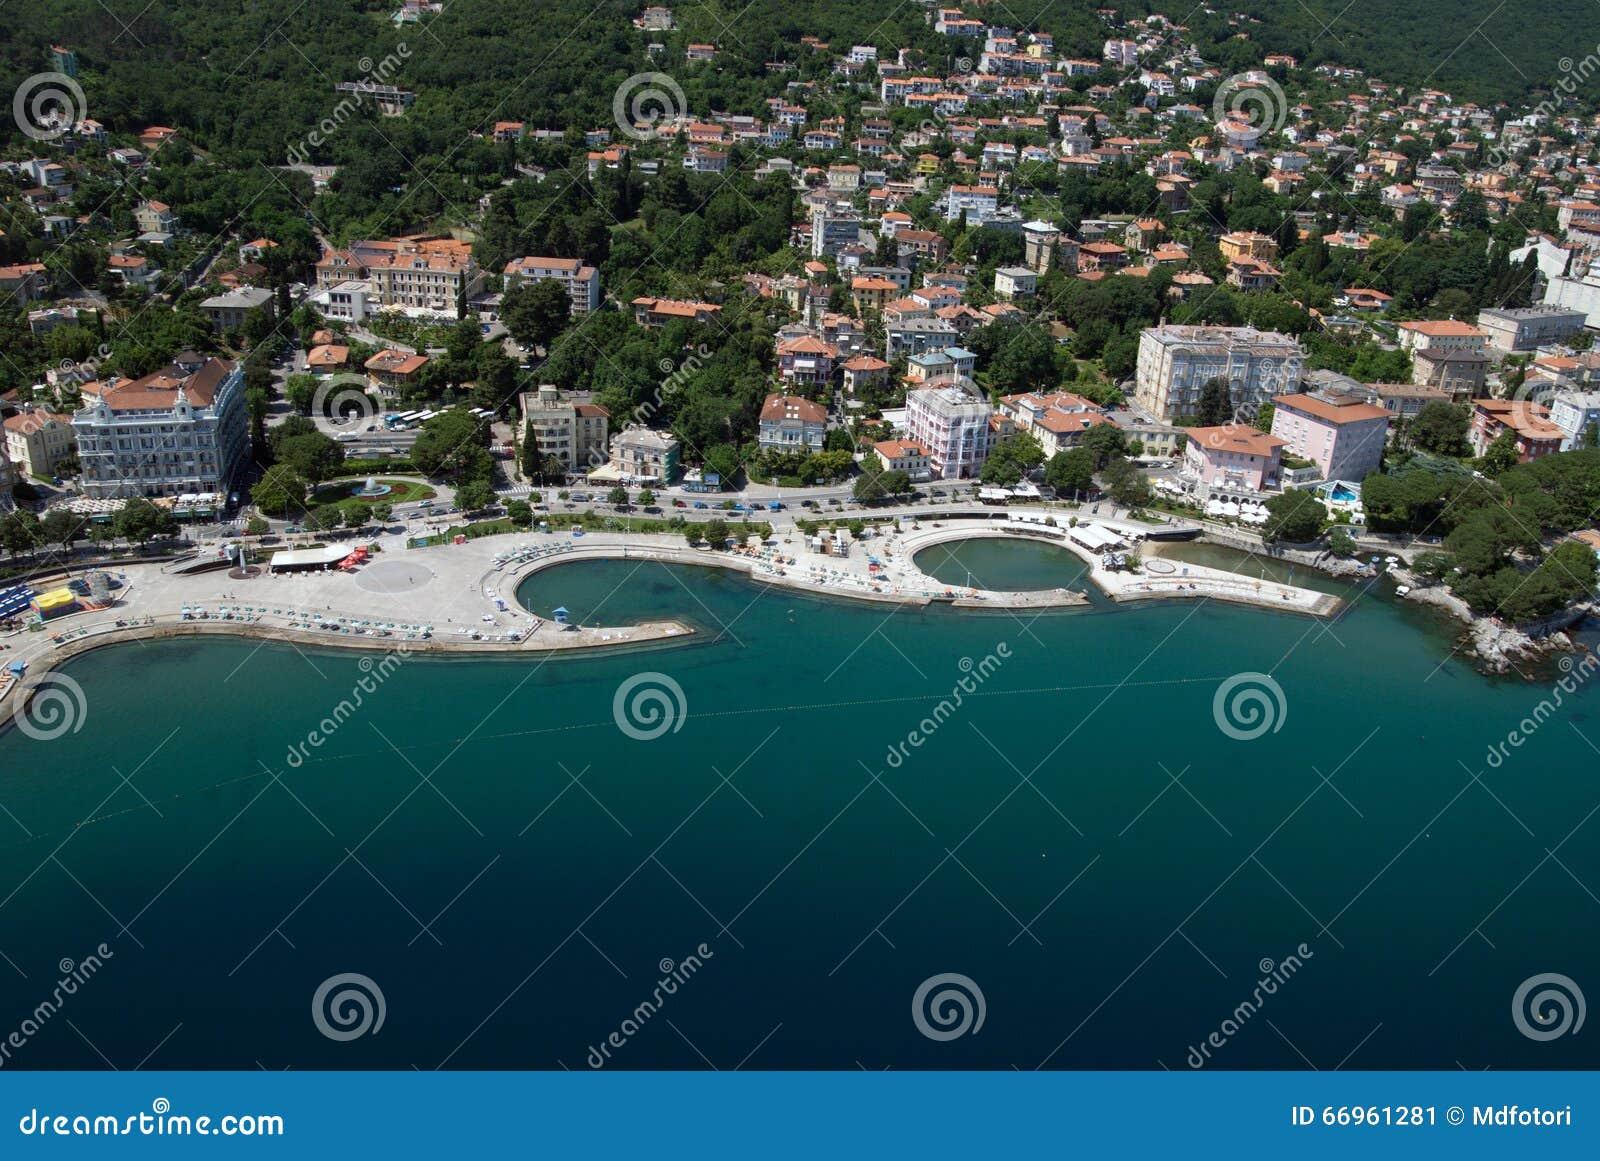 Air photo of opatija city center on adriatic sea in for Design hotel opatija croatia